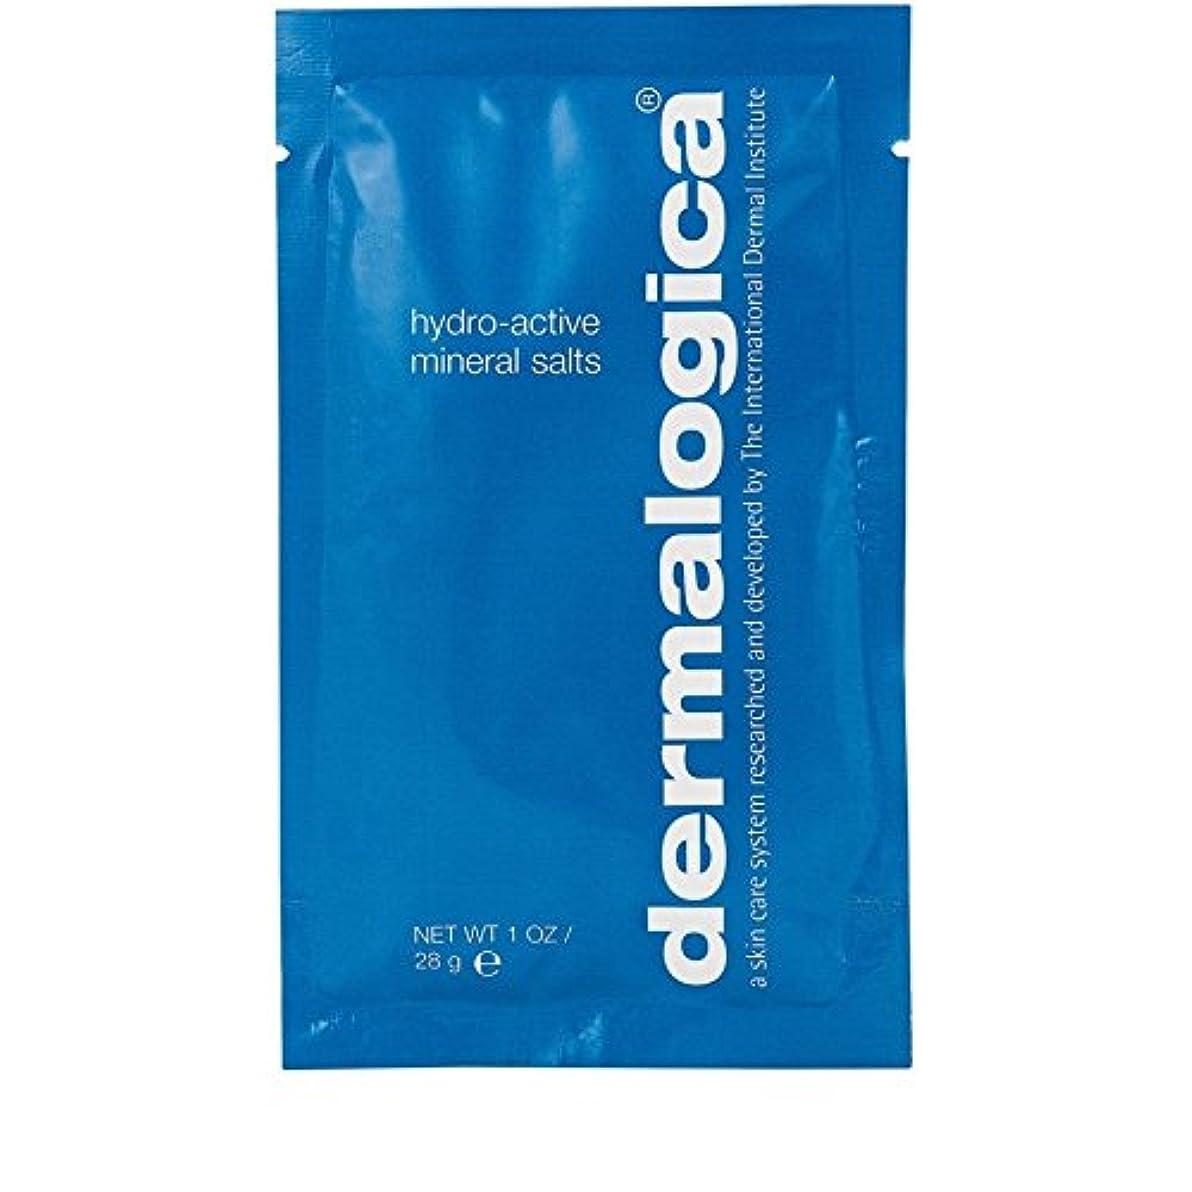 Dermalogica Hydro Active Mineral Salt 28g - ダーマロジカ水力アクティブミネラル塩28グラム [並行輸入品]